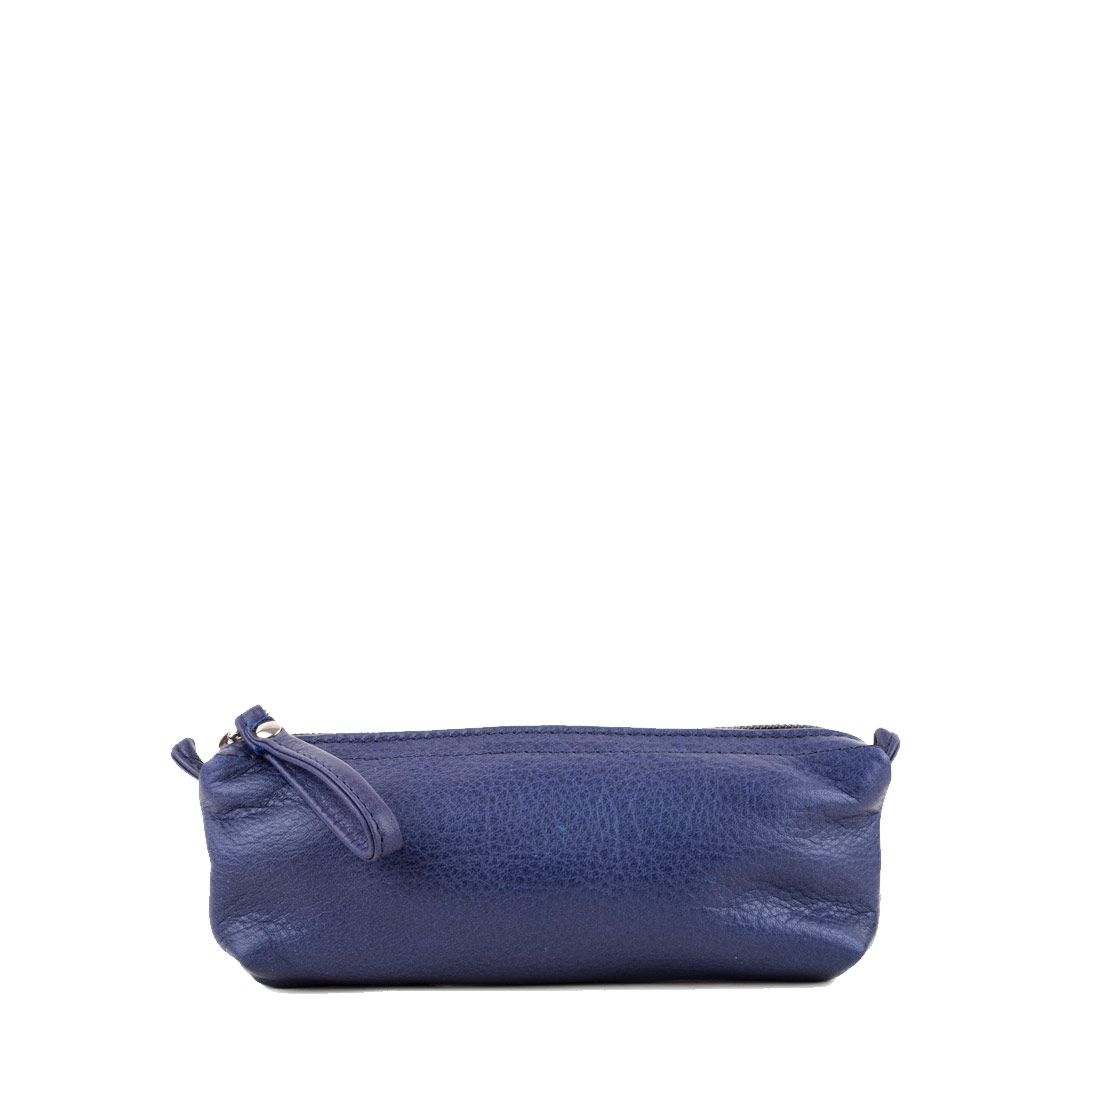 Make Up Bag In Purple